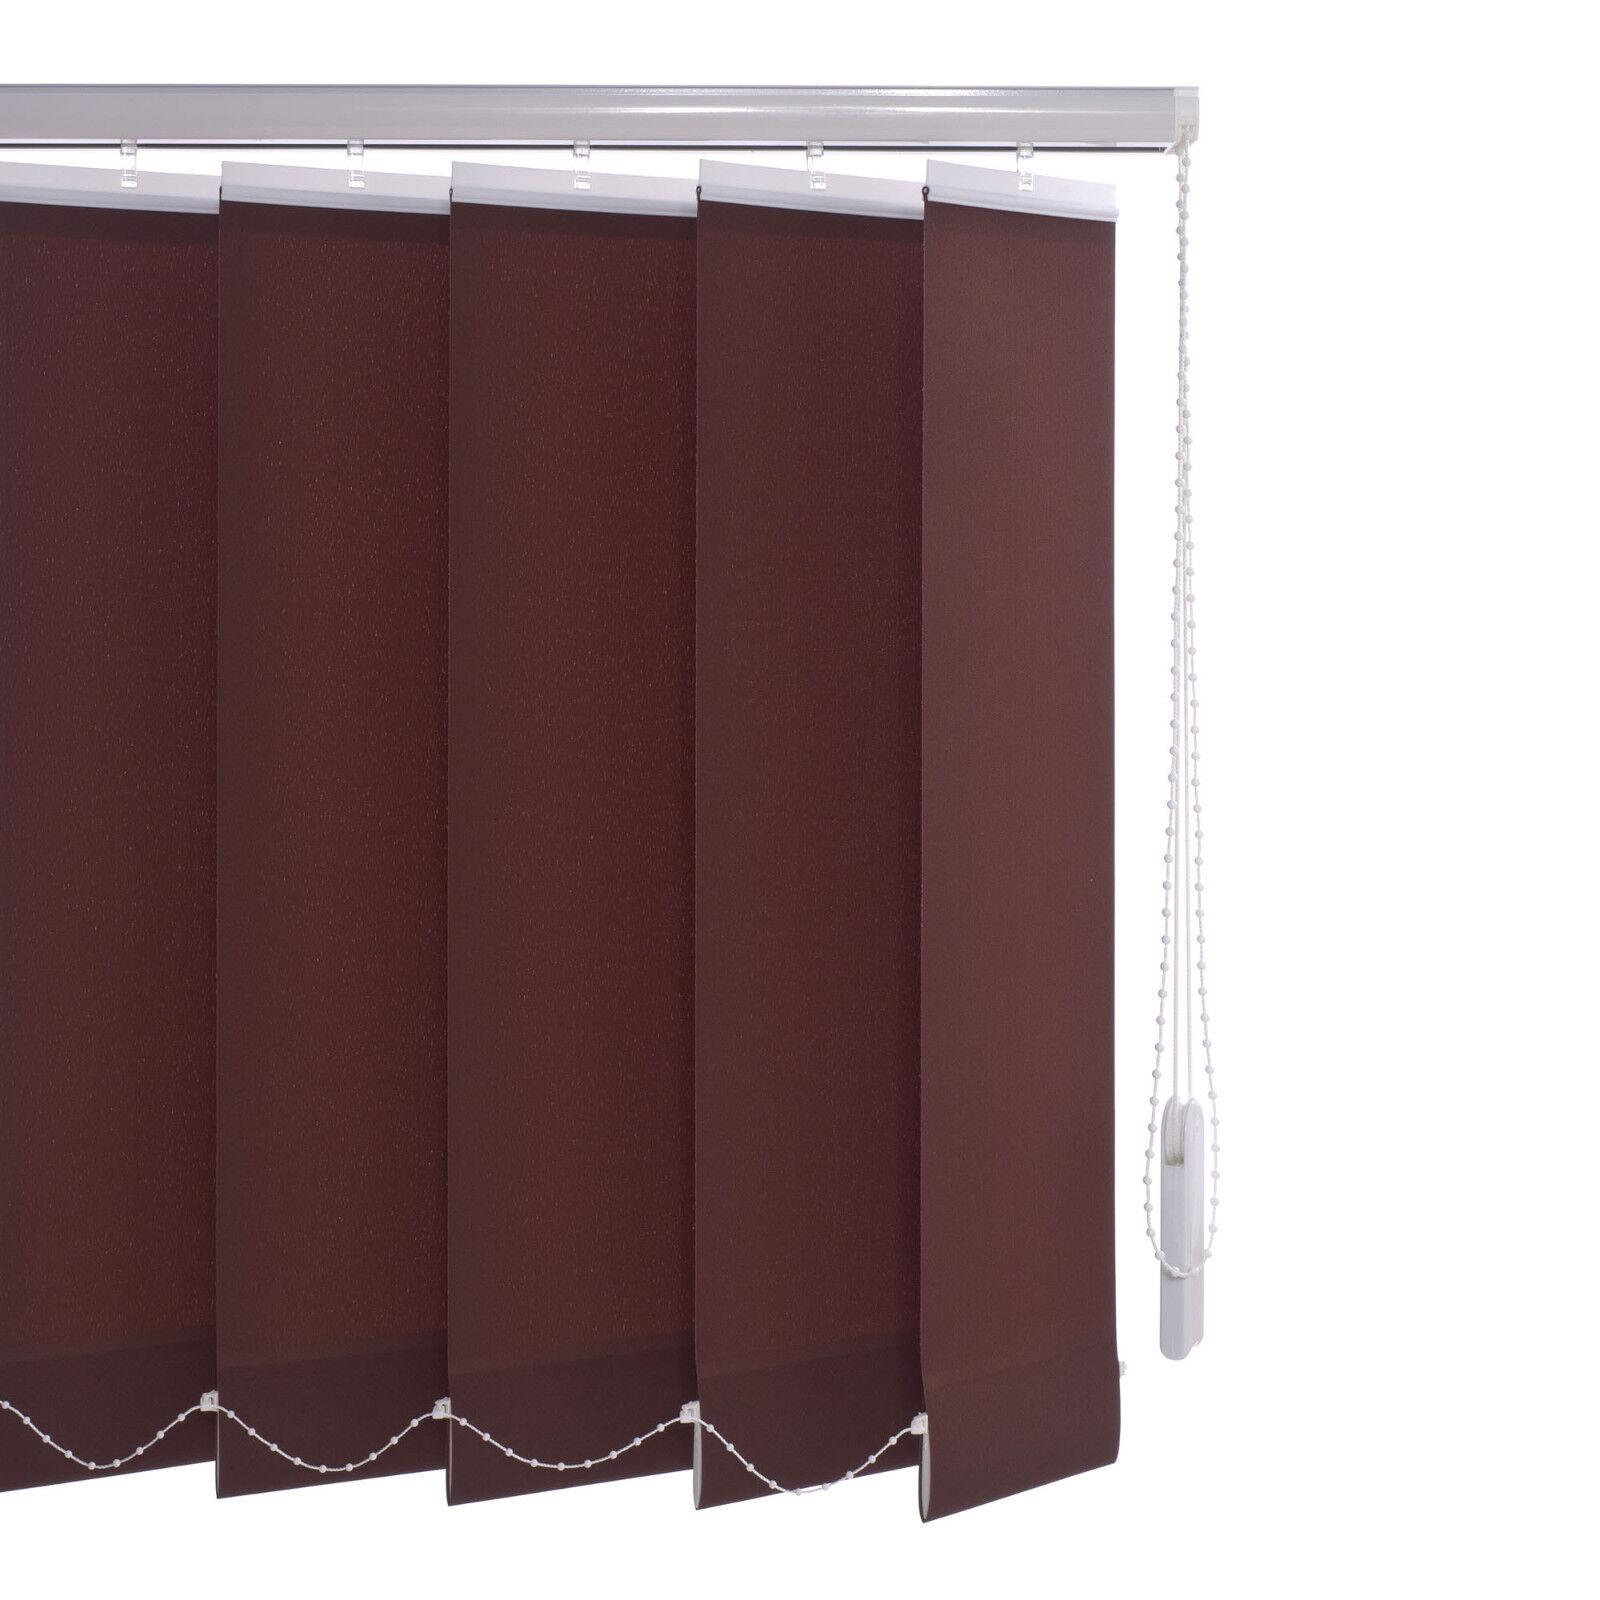 Grünikal Lamellen Jalousie Vorhang Lamellenvorhang Fenster Türen Flächenvorhang | Bevorzugtes Bevorzugtes Bevorzugtes Material  07bb15